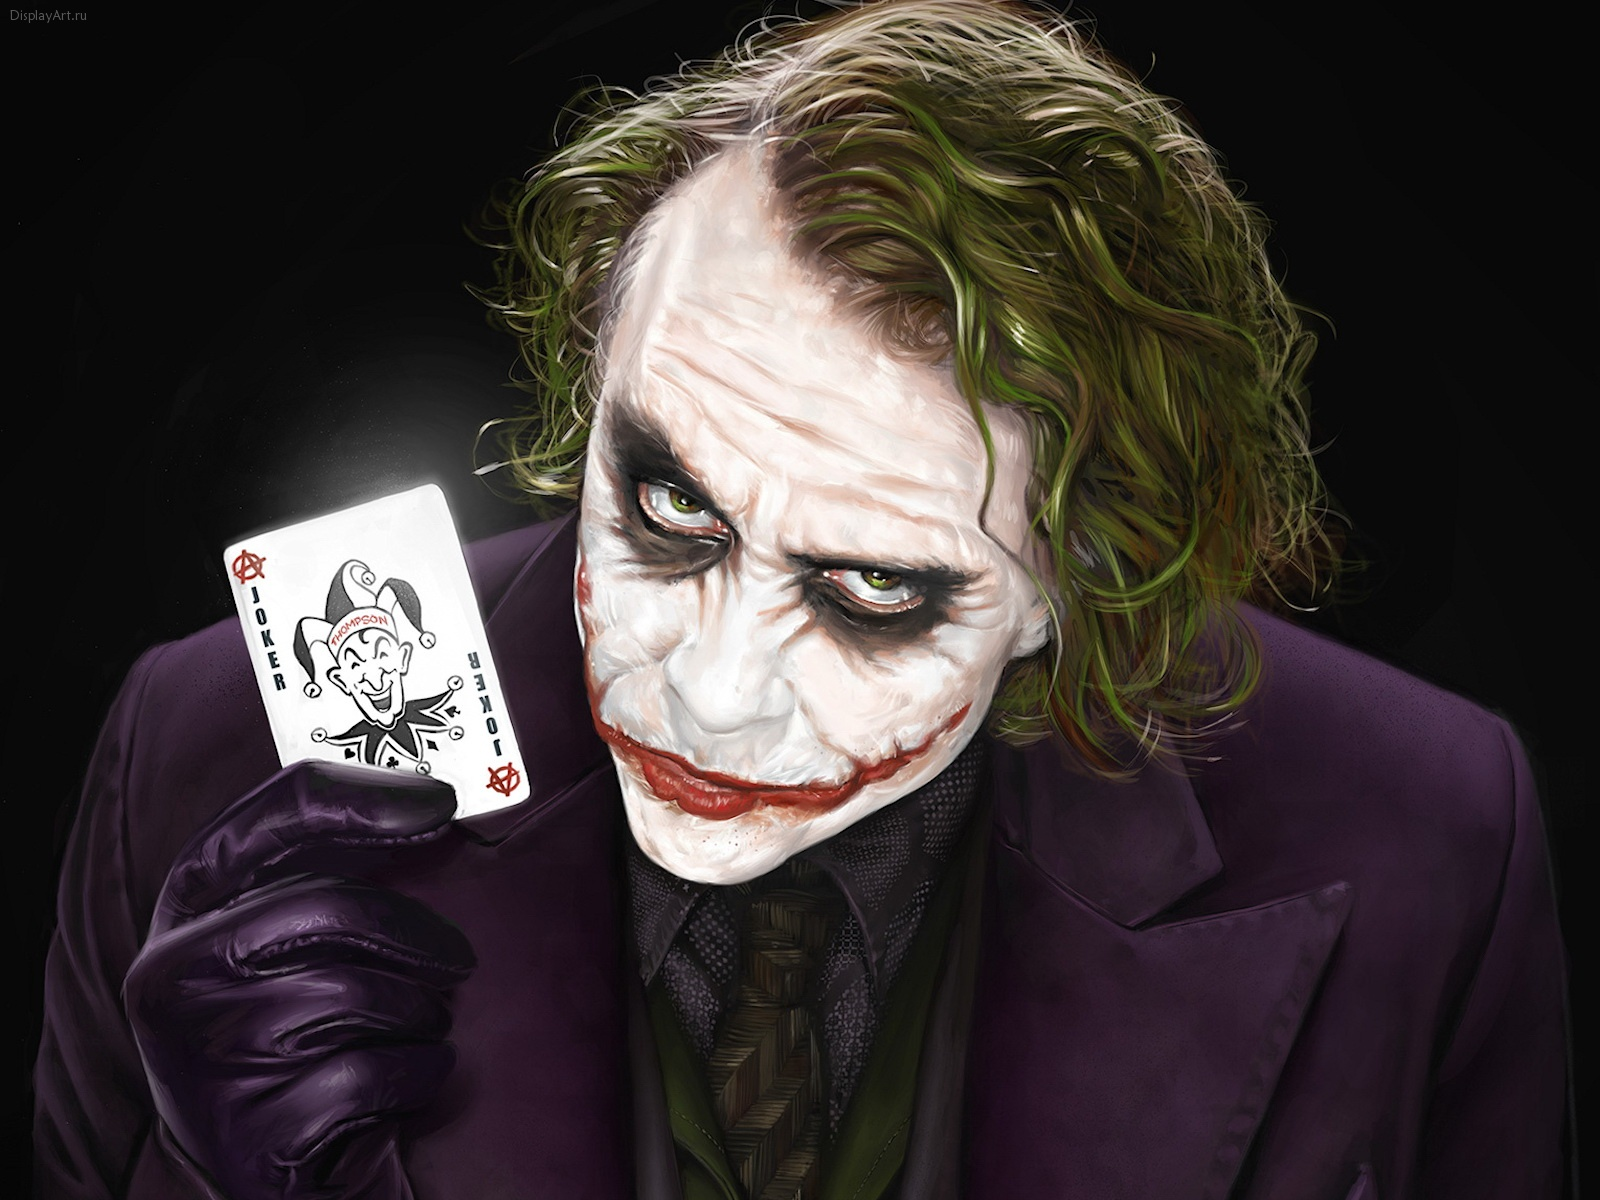 Joker Desktop Wallpapers FREE on Latorocom 1600x1200